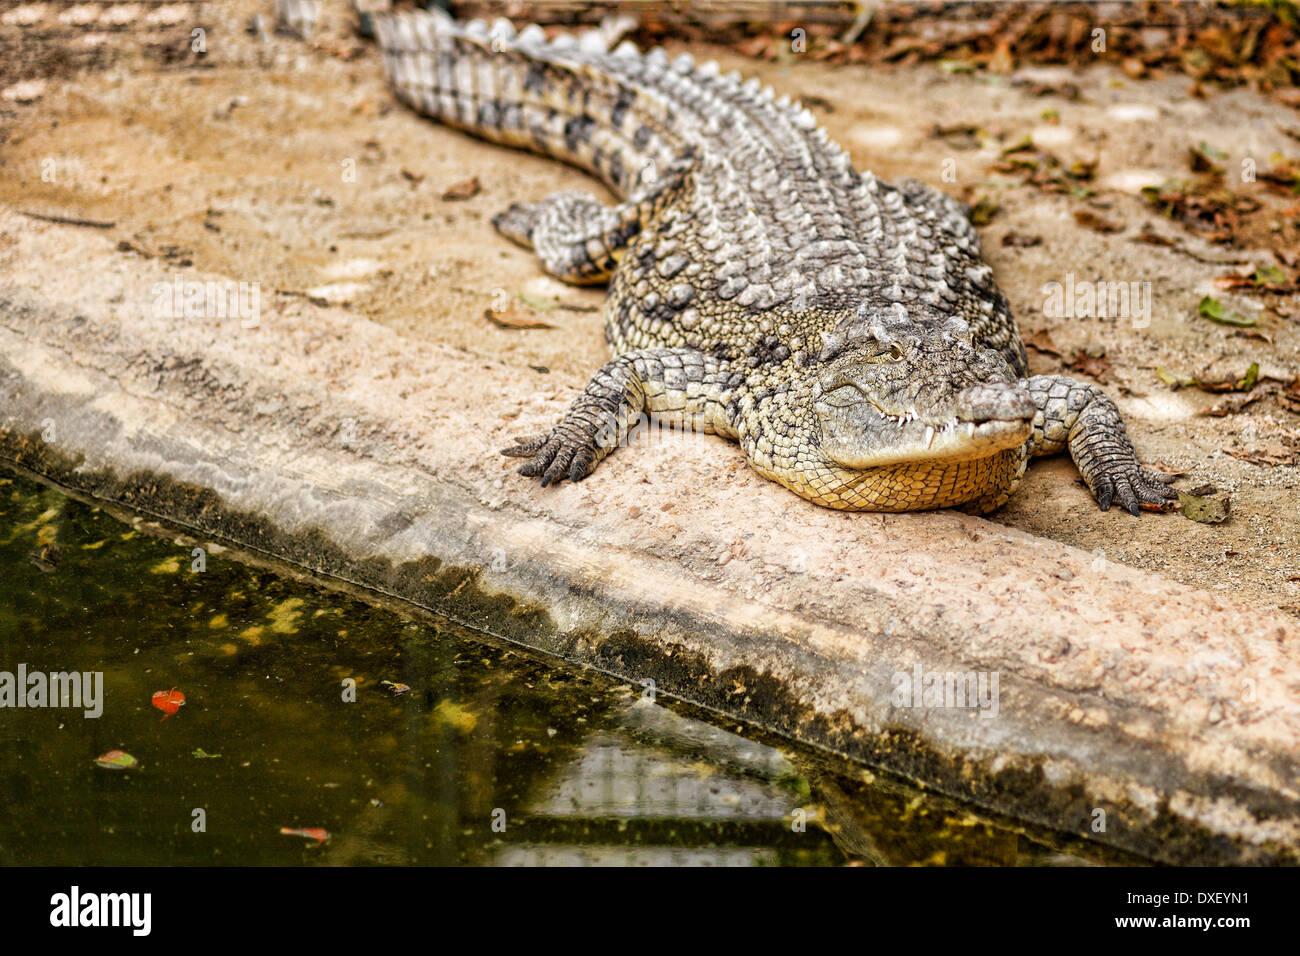 Crocodile in the zoo - Stock Image